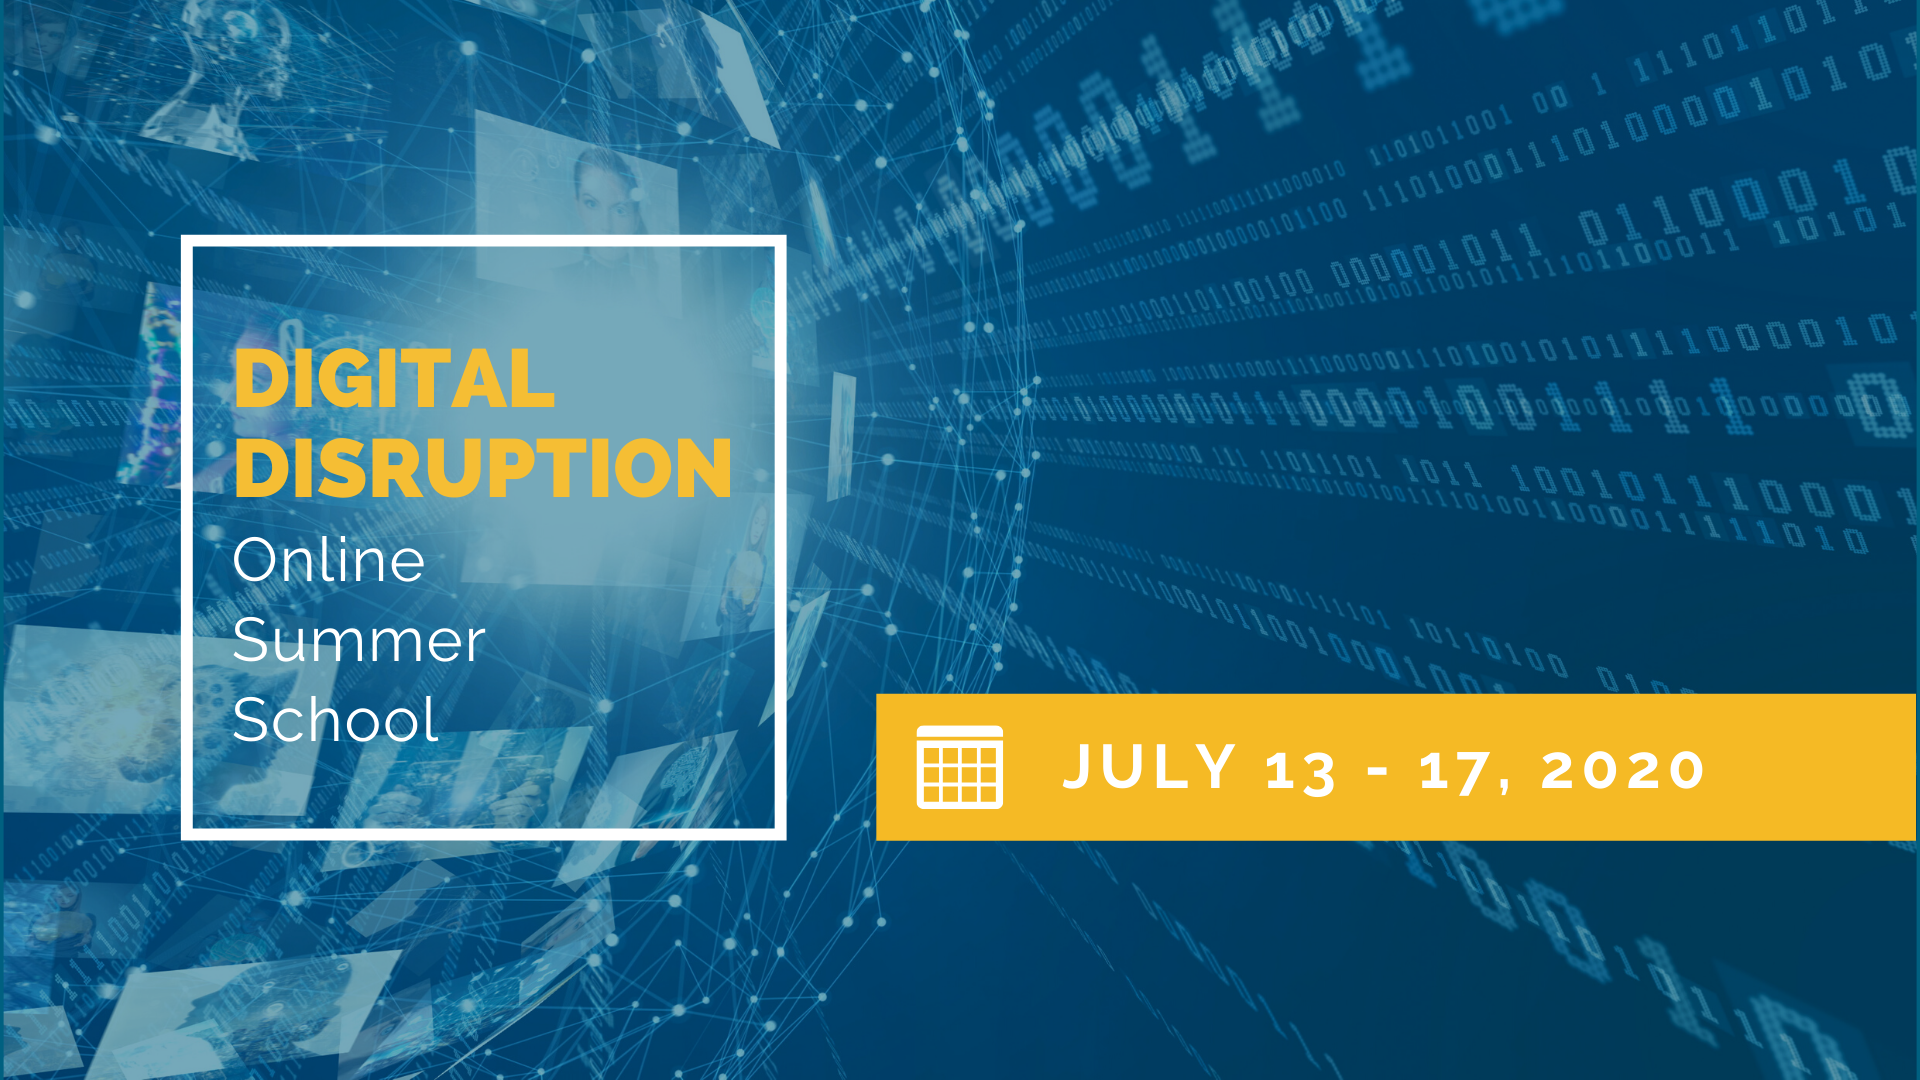 Online Summer School at Faculty of Business Adminsitration: Digital Disruption